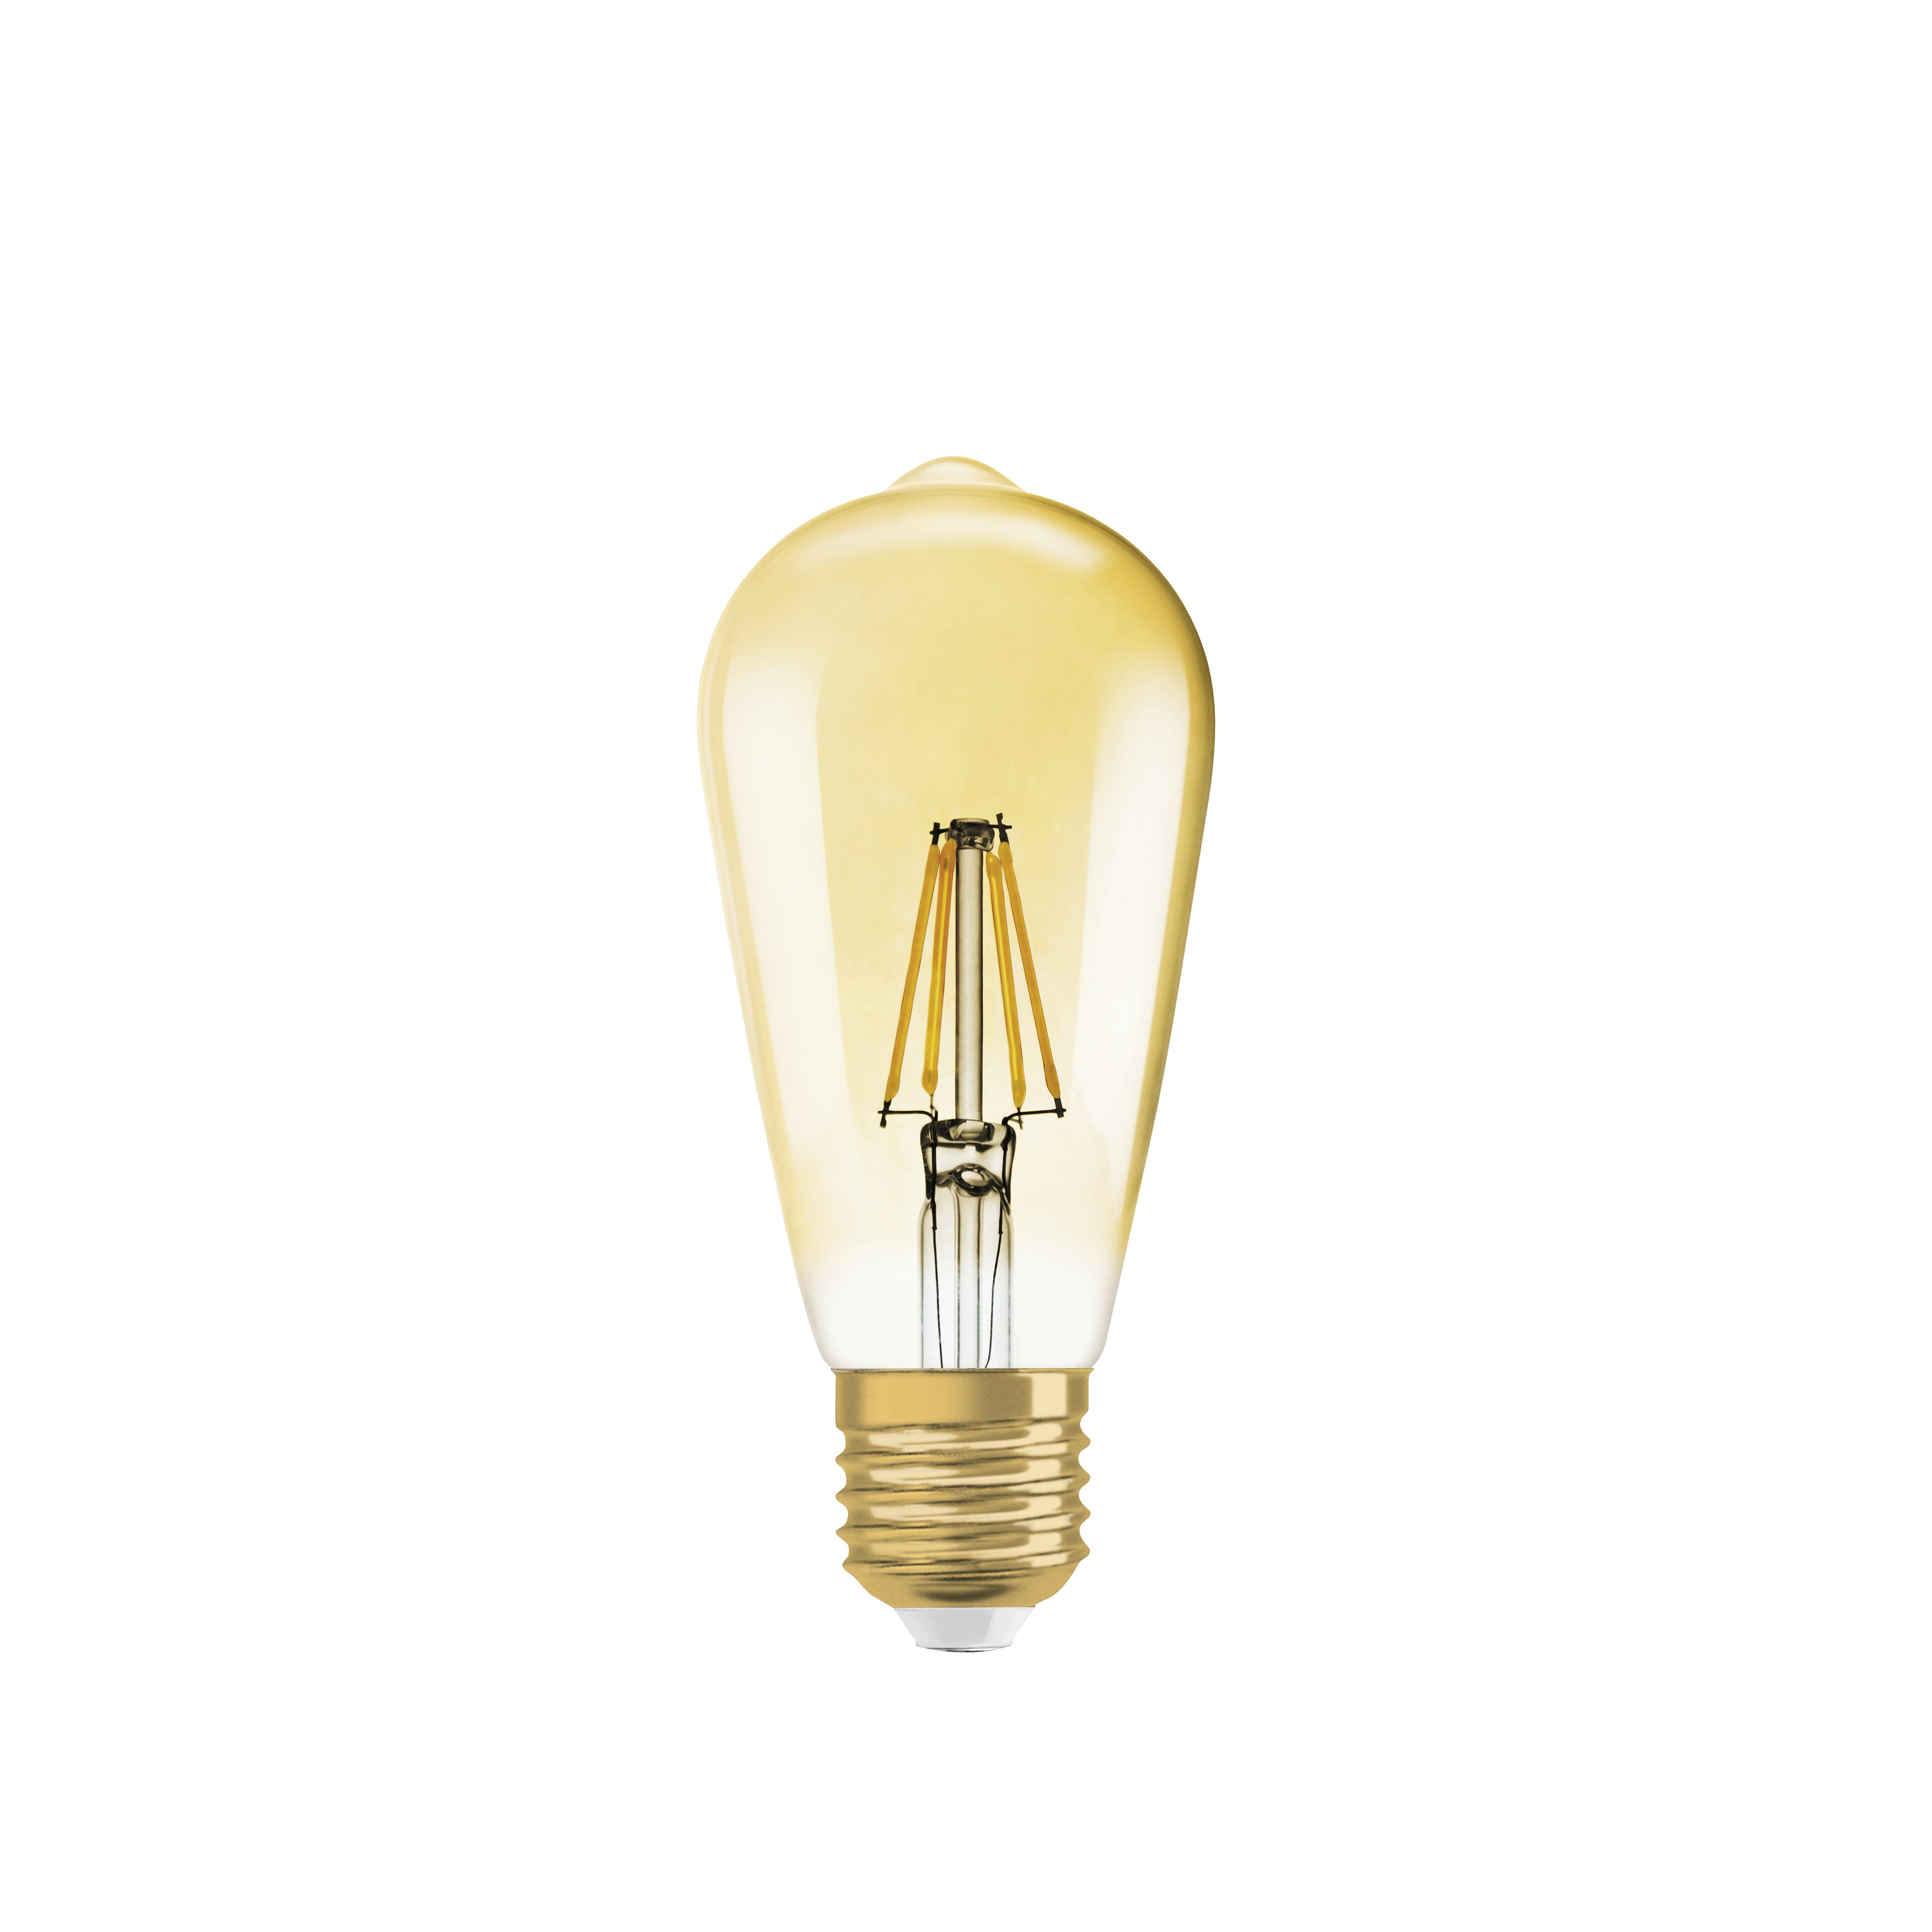 Led-lampa Osram Vintage 1906 Edison 54 710LM/827 E27 Filament Guld Dimbar